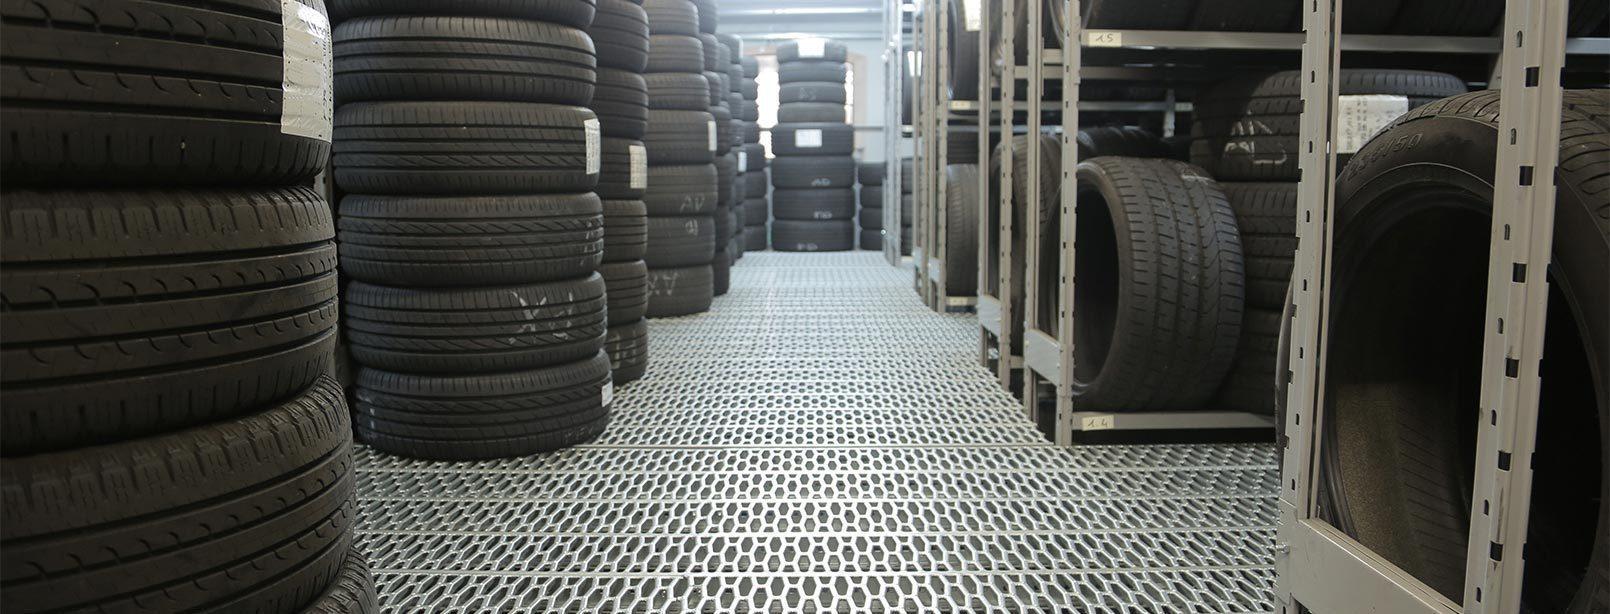 Lessinoise du pneu - Garage auto